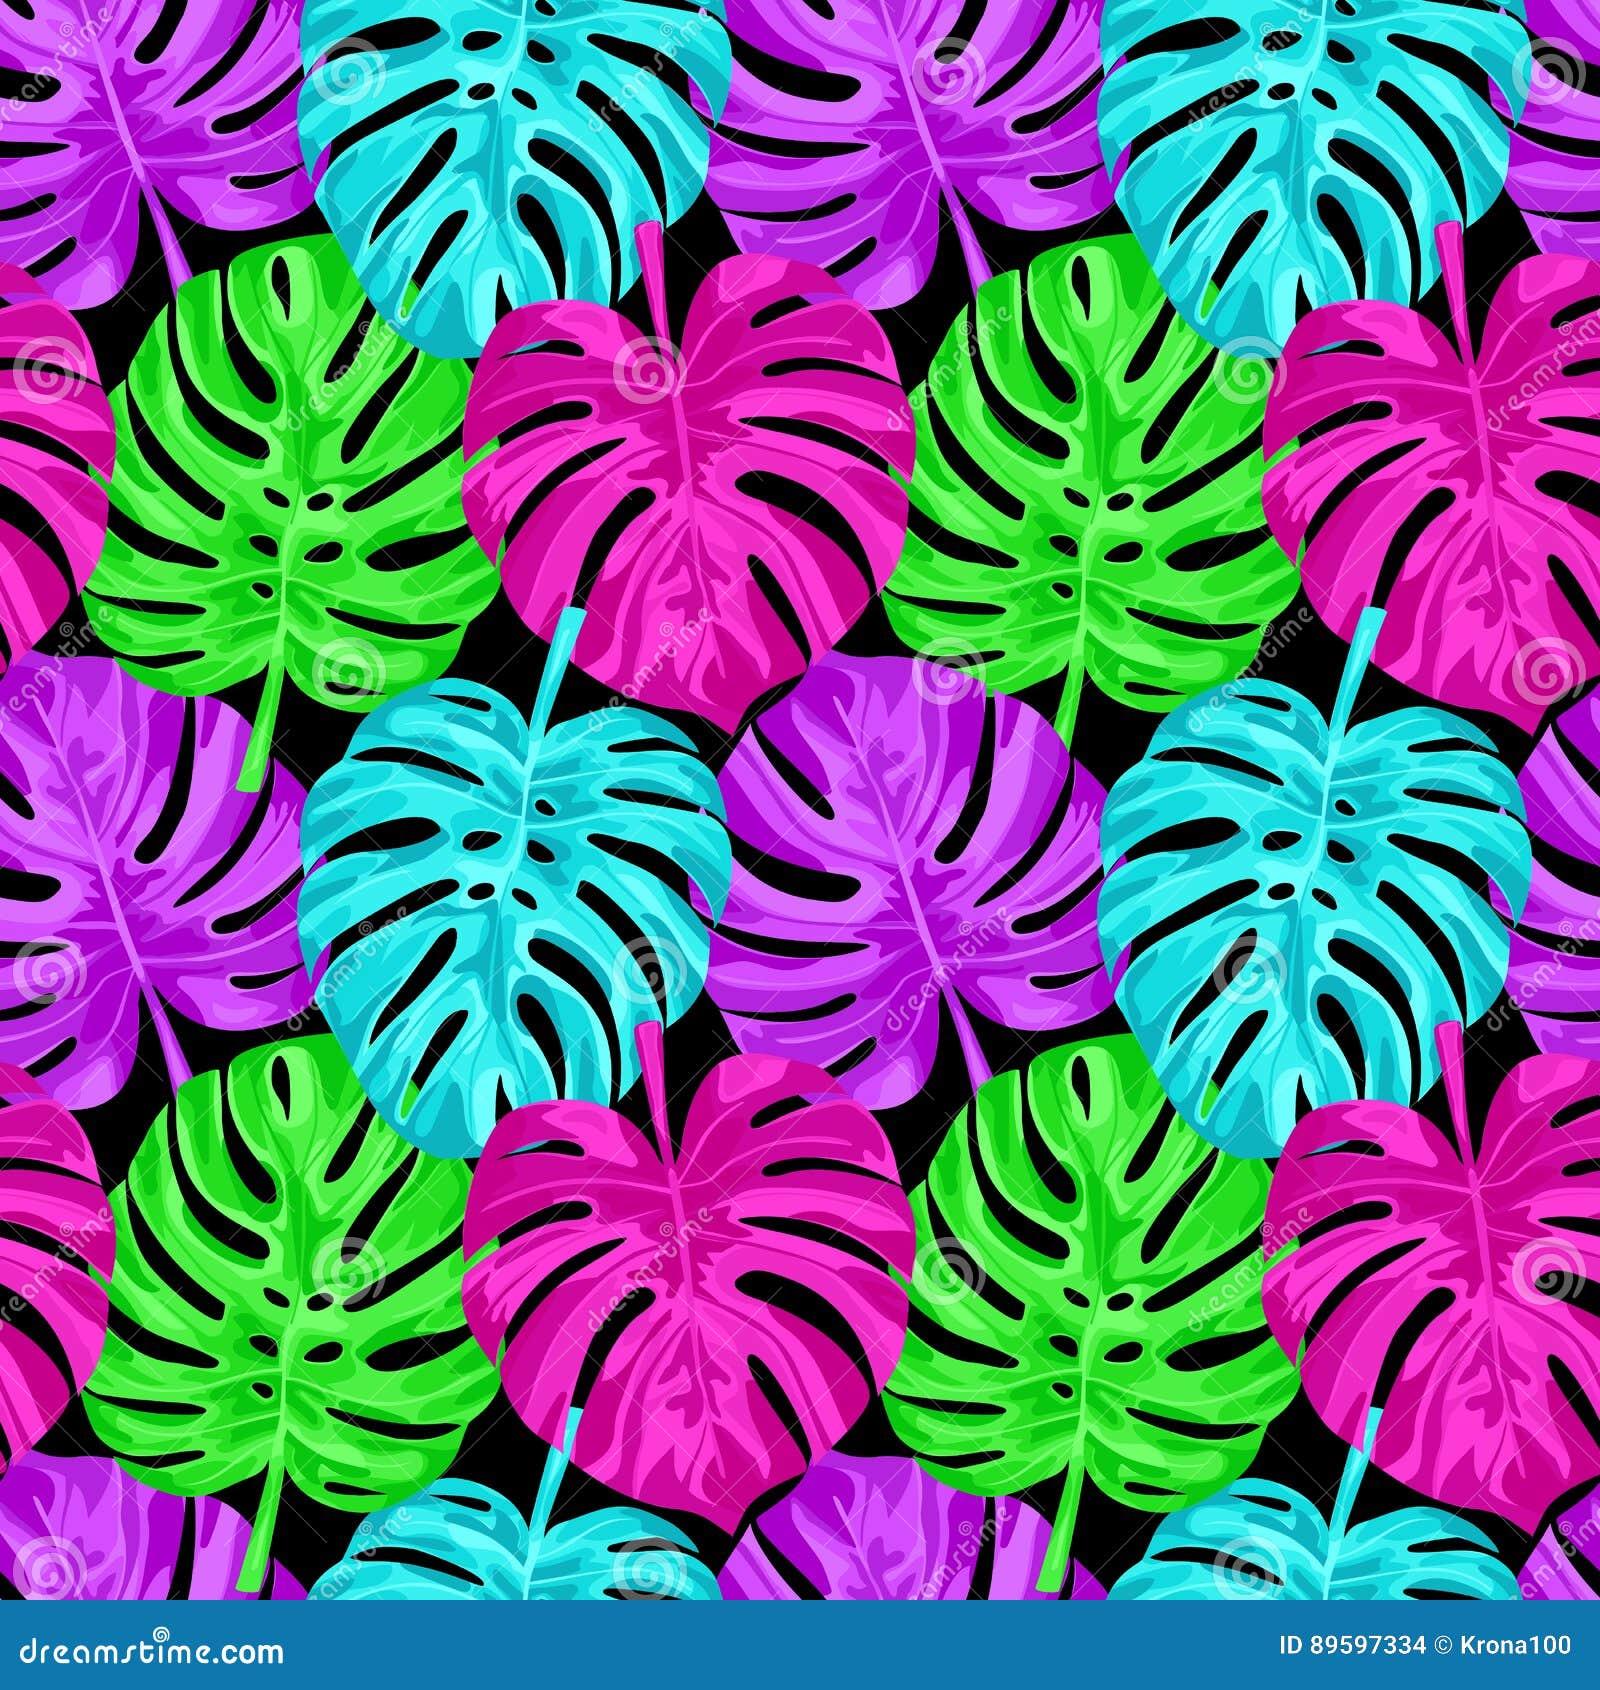 Pink Monstera Seamless Pattern Stock Vector Illustration Of Design Green 89597334 Green neon lights frame with tropical leaves mockup design. dreamstime com